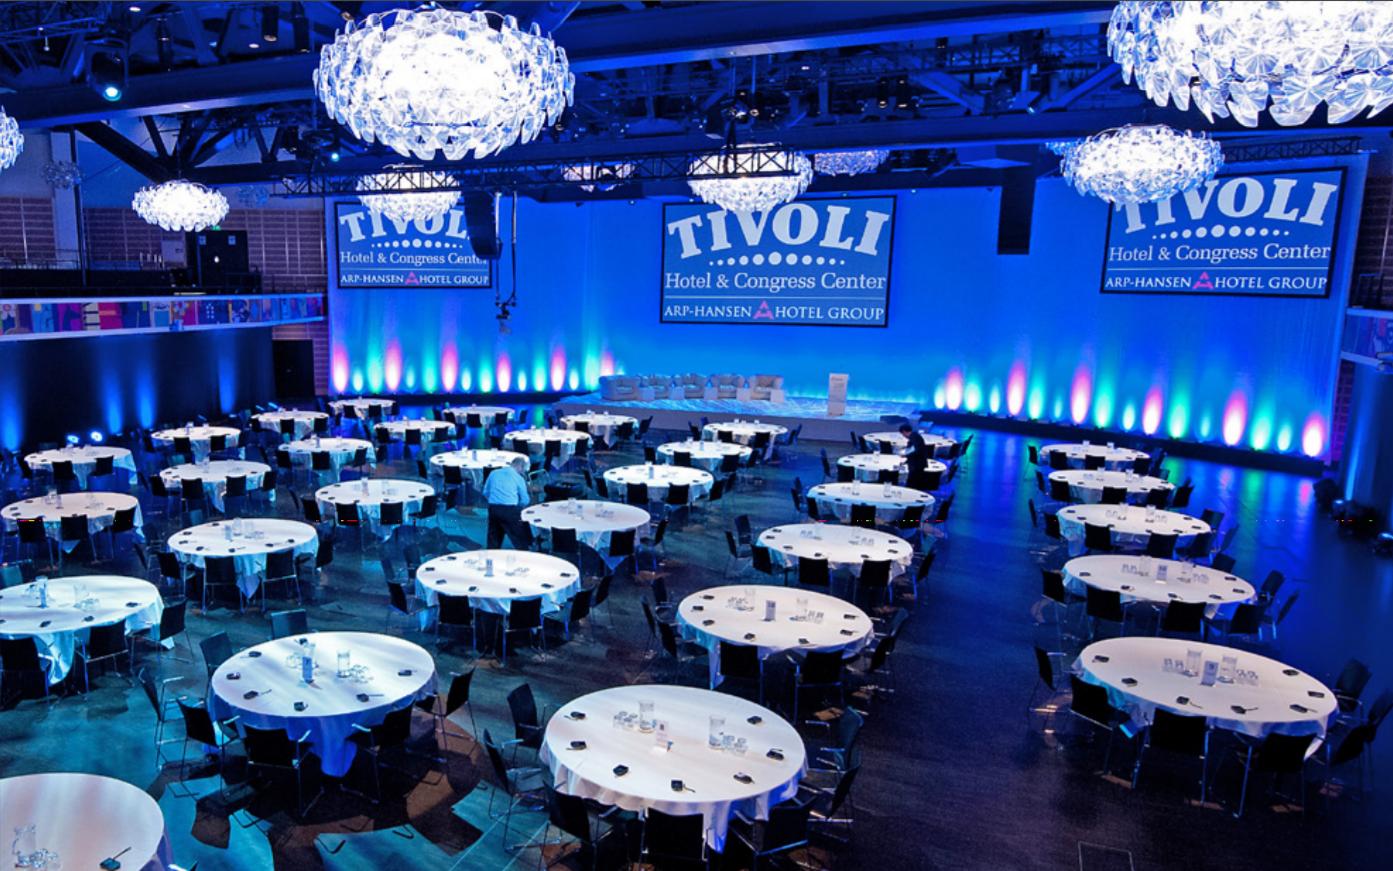 Horestas årsmøde foregår i Tivoli Hotel & Congress Center. (Foto: Tivoli Hotel | PR)